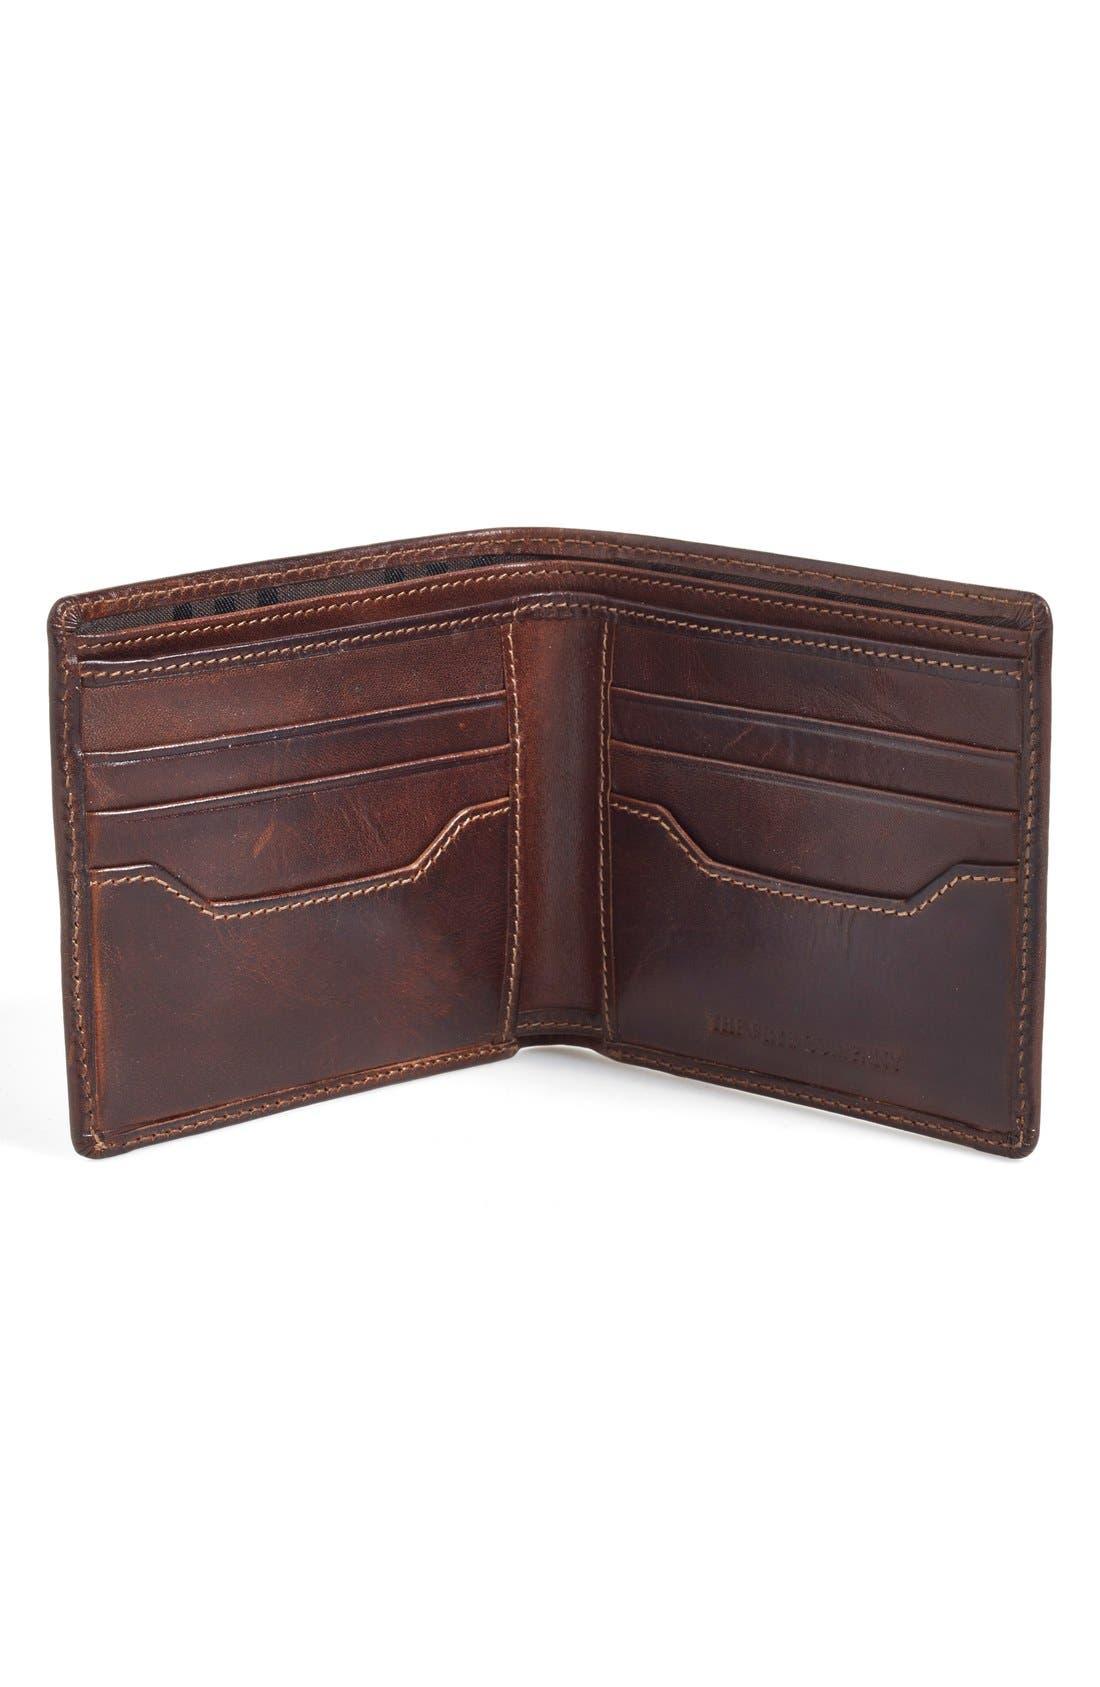 'Logan' Leather Billfold Wallet,                             Alternate thumbnail 3, color,                             SLATE